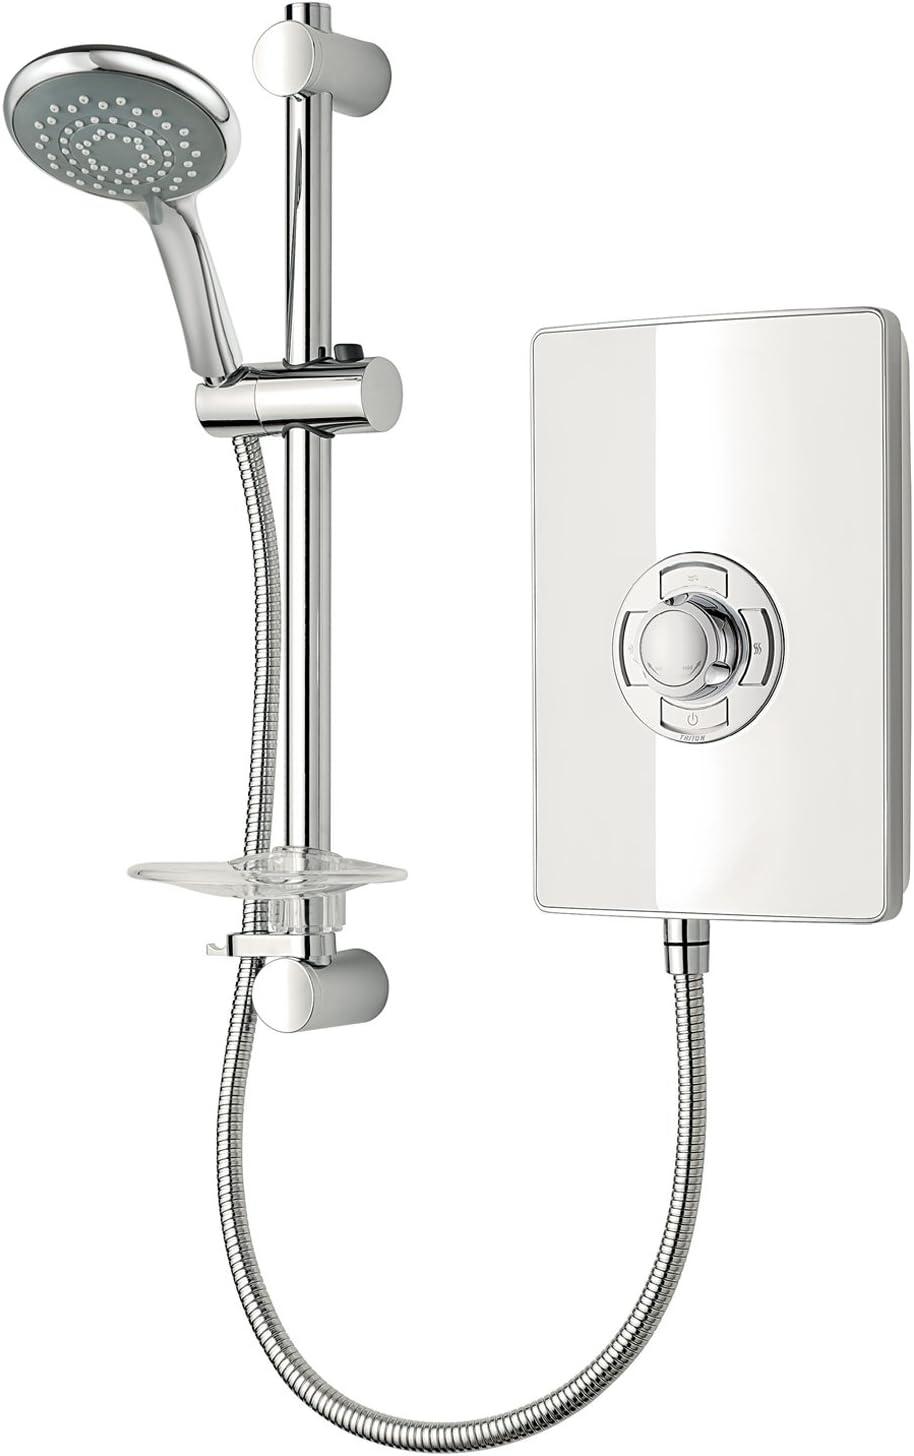 Triton Showers Aspirante Collection II Contemporary Electric Shower, White Gloss, 8.5 KW